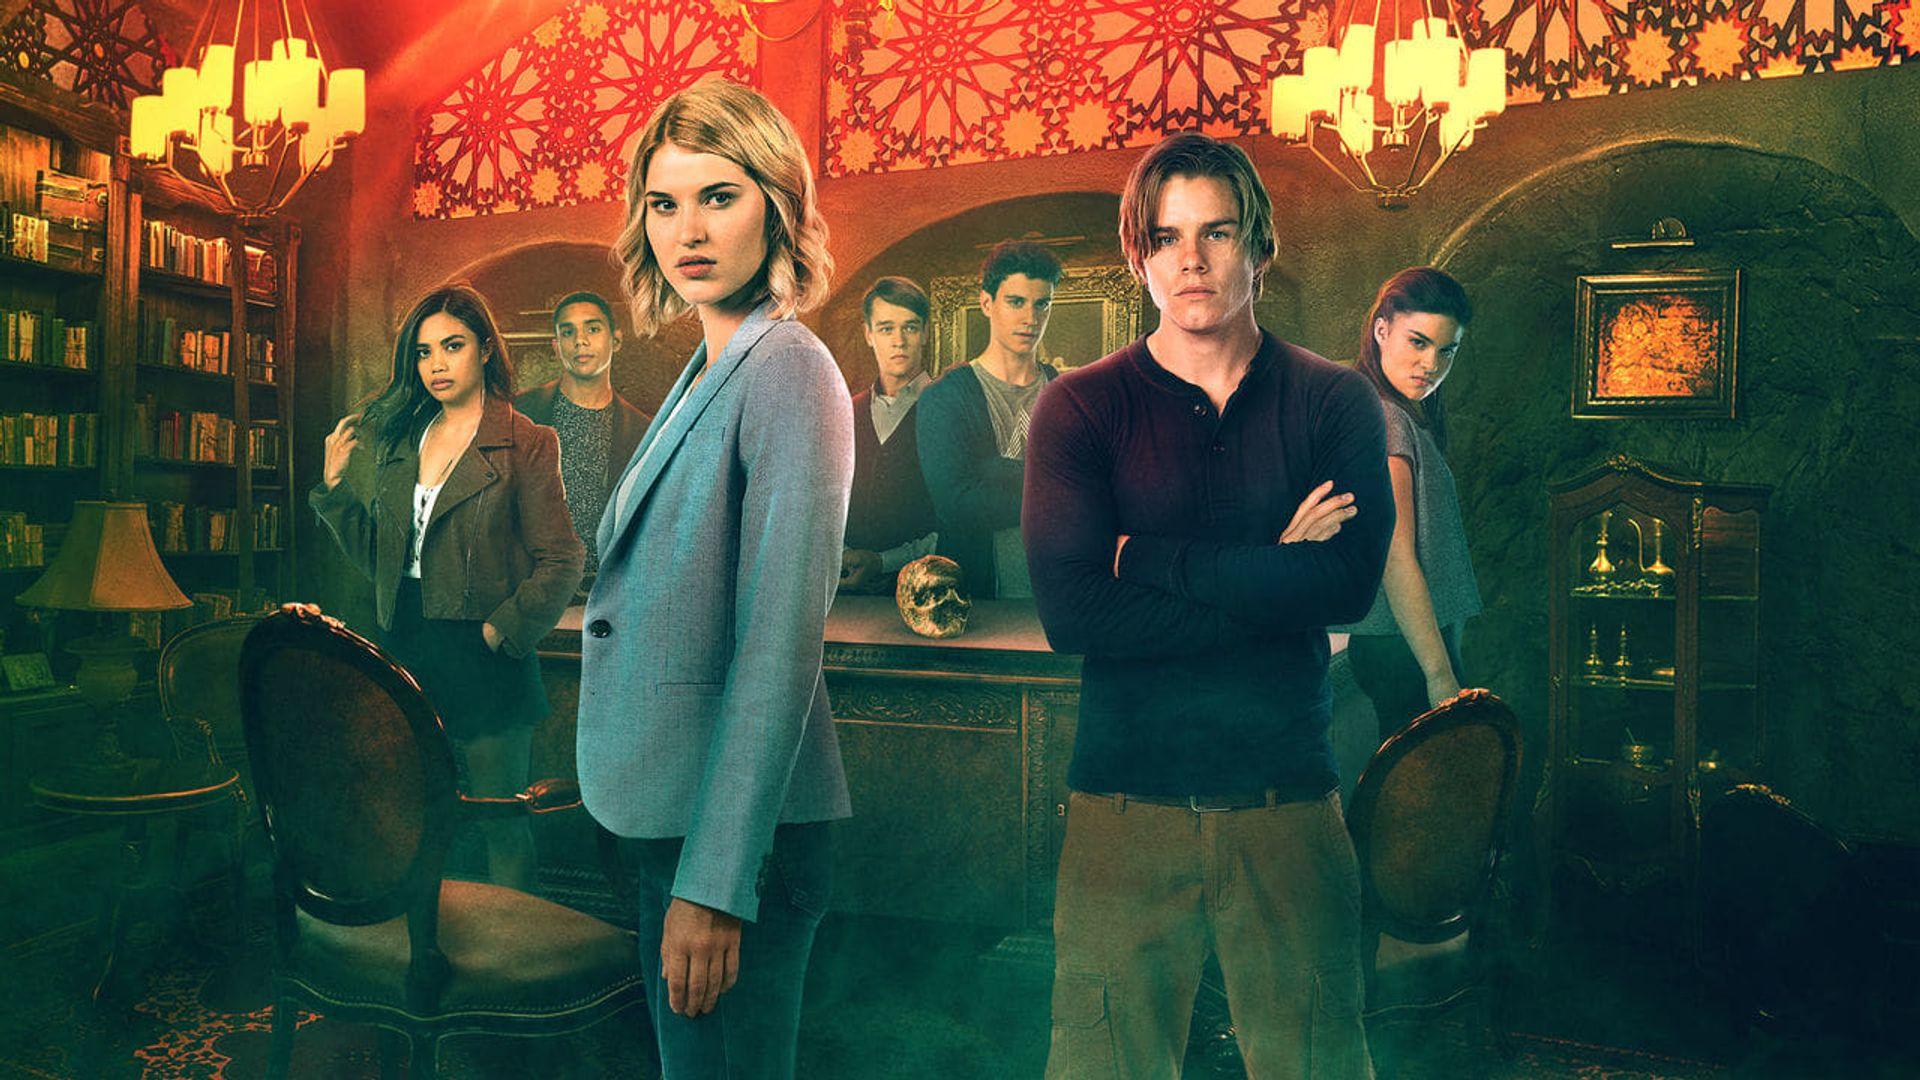 similar web series like twilight and harry potter